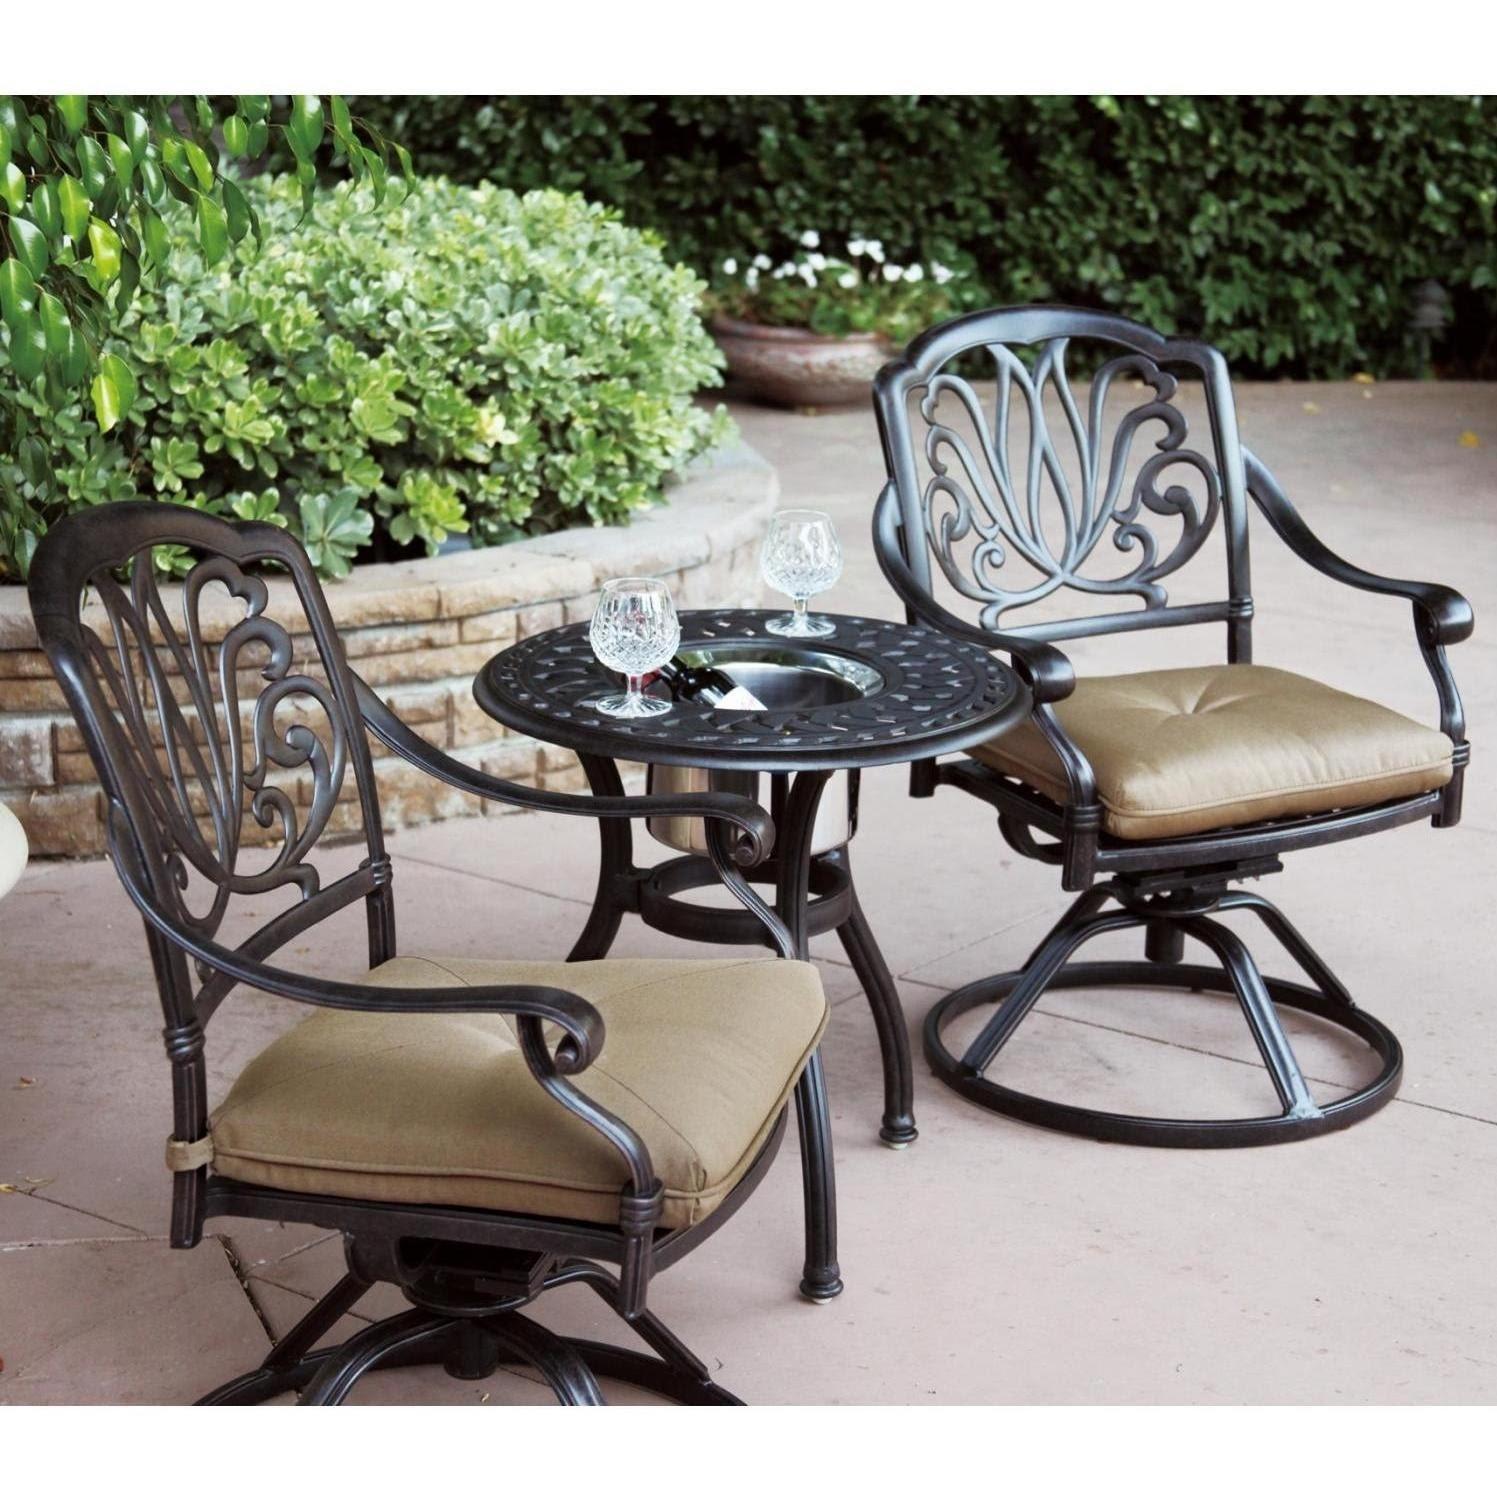 Patio Furniture Bistro Set Cast Aluminum Swivel Rocker 3pc ...